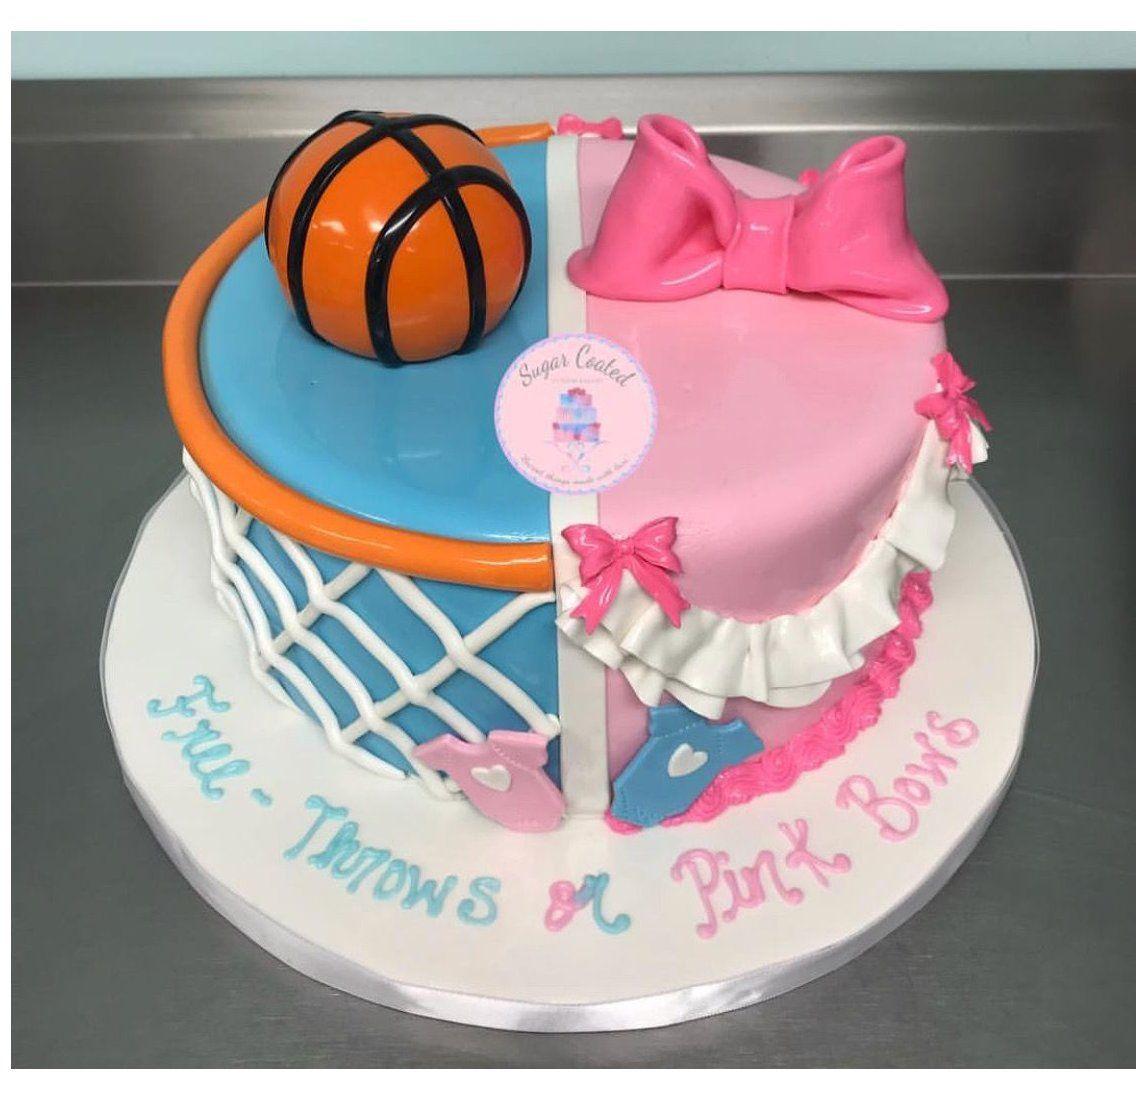 Gender Reveal Pins basketball buttons pins gender reveal ideas pink or blue basket ball gender reveal